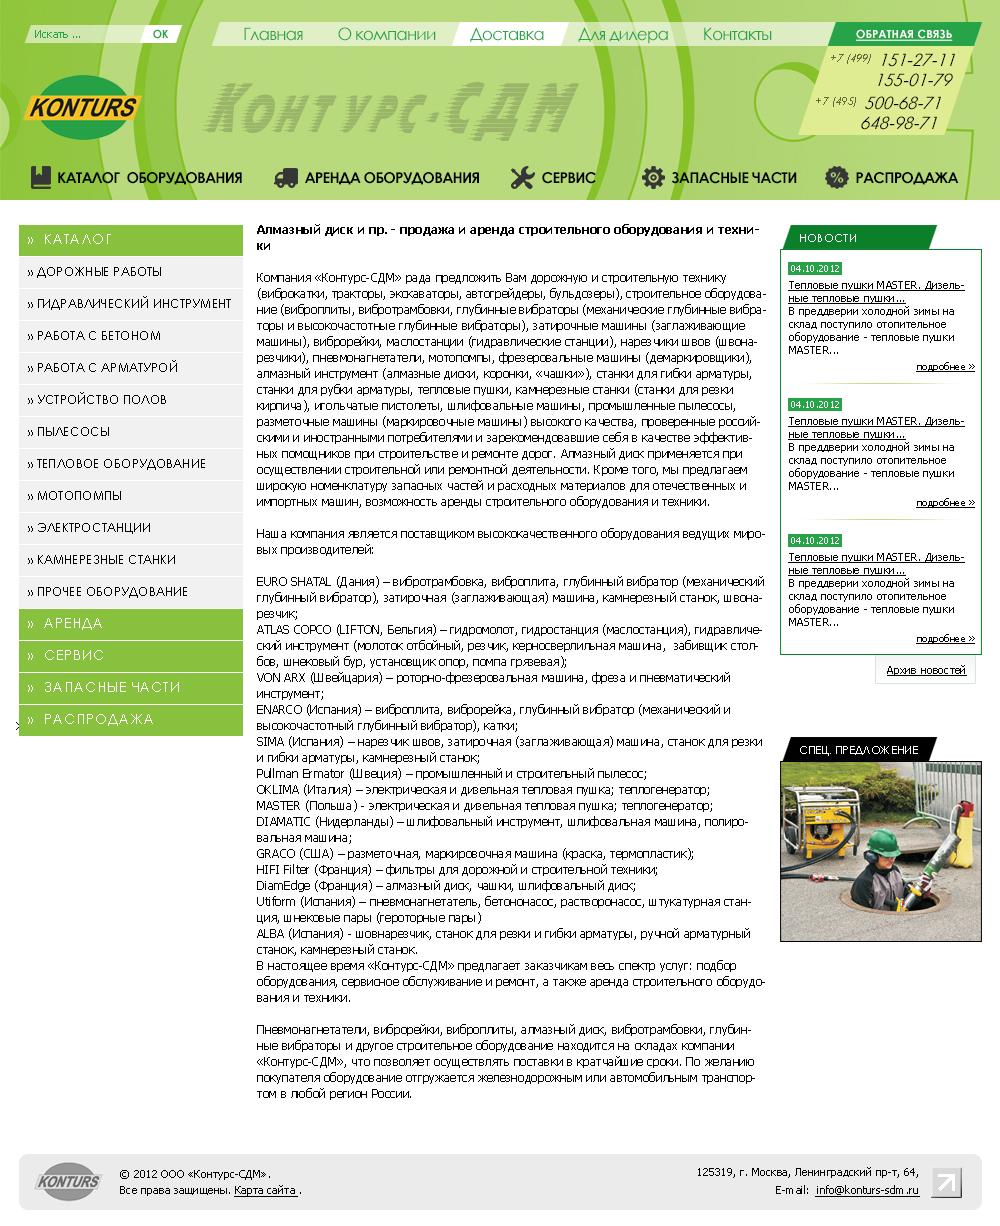 Разработка сайта «KONTURS»